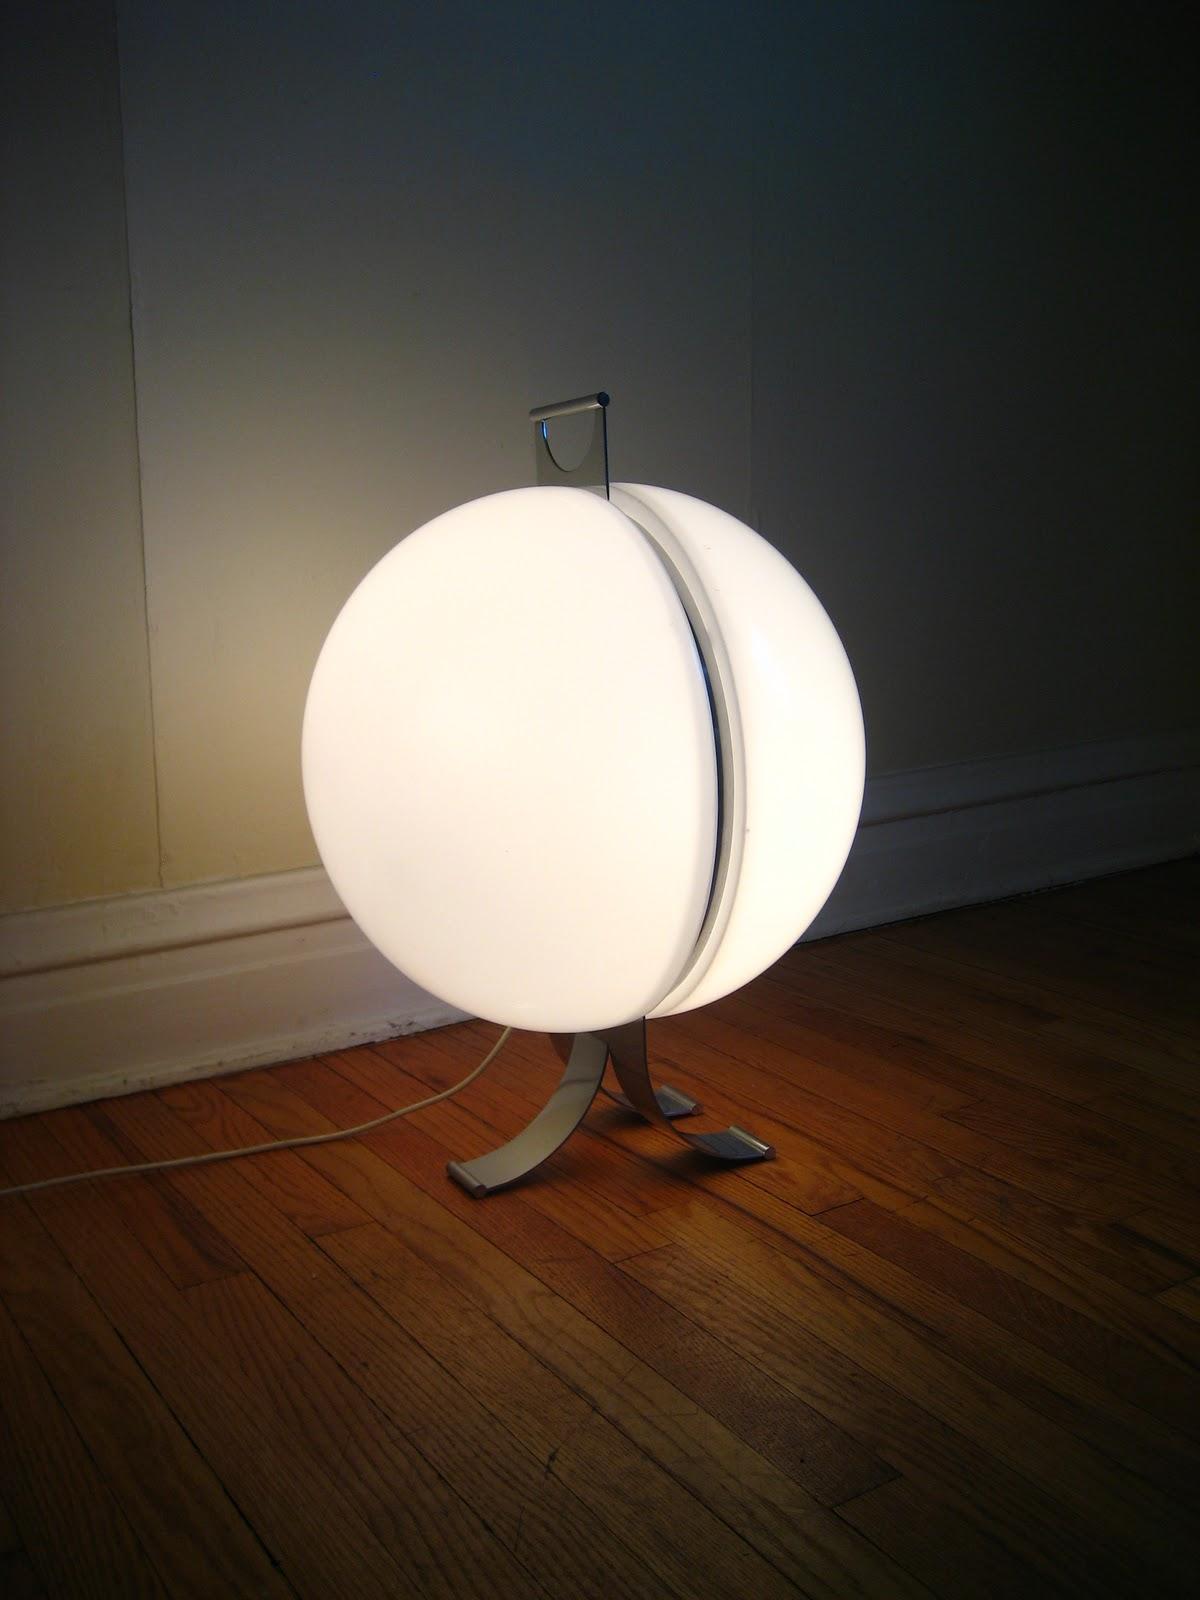 flatout design orb floor lamp. Black Bedroom Furniture Sets. Home Design Ideas